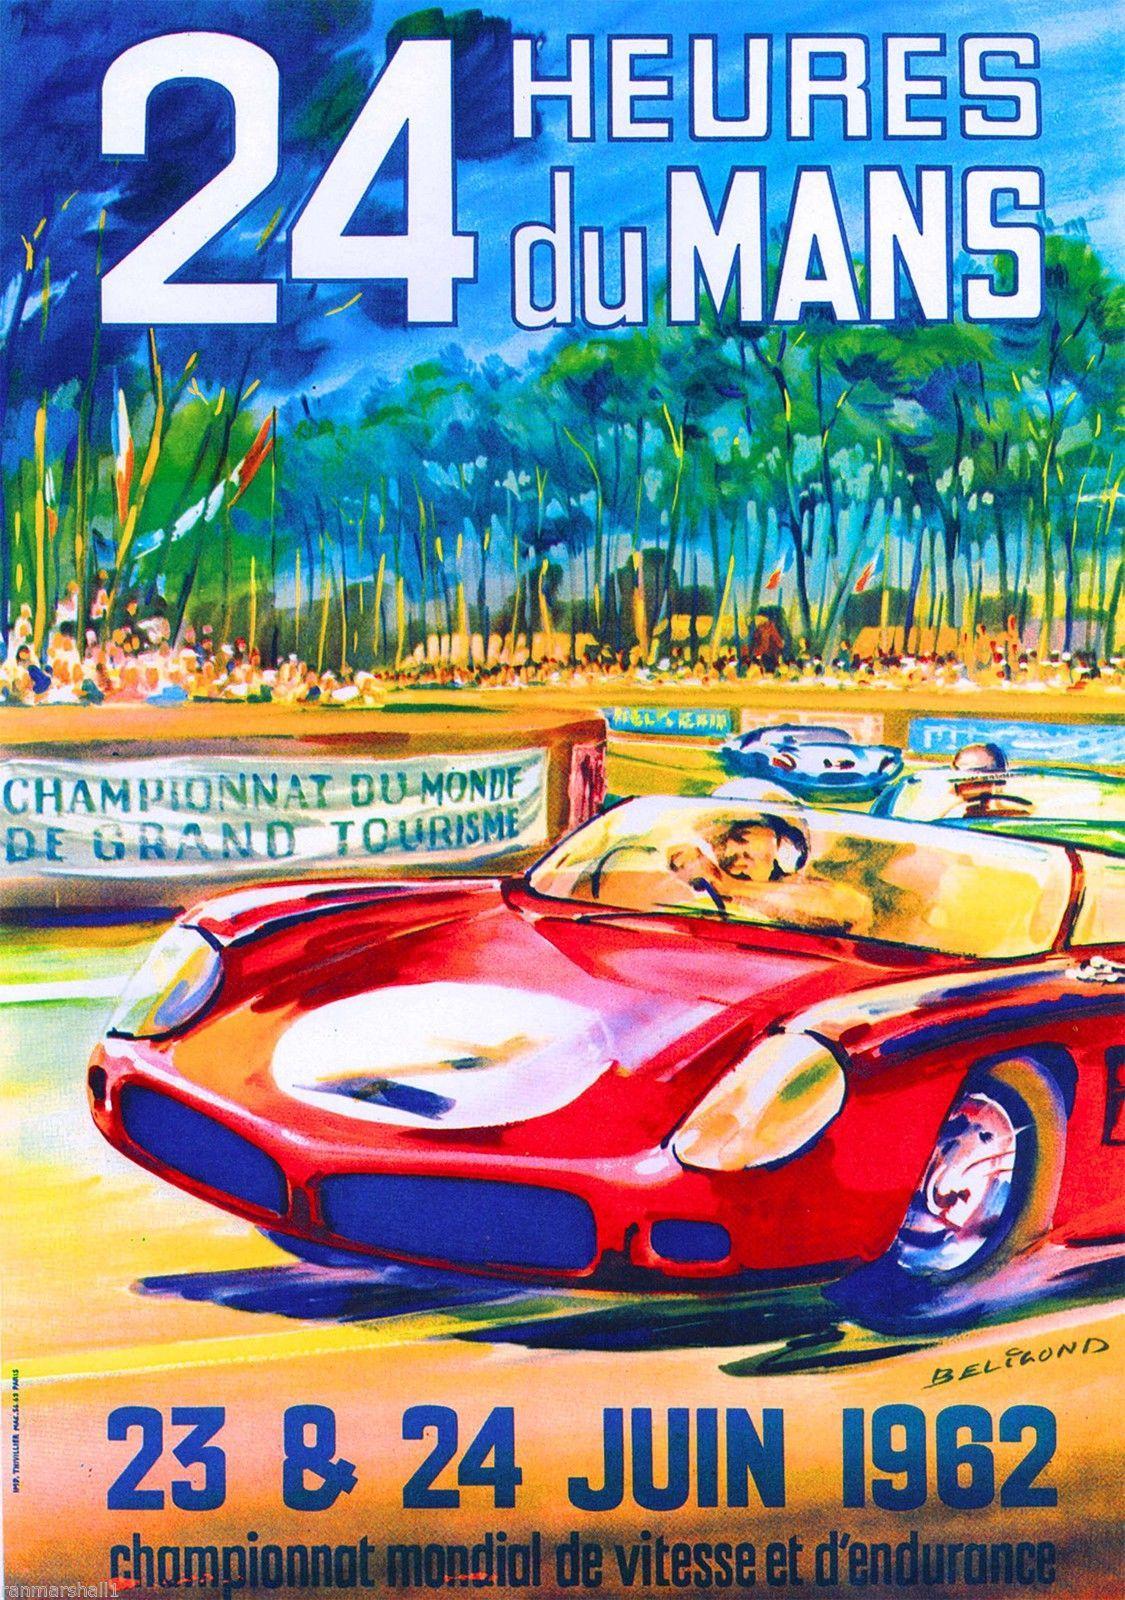 1962 24 Hours Le Mans French Automobile Race Advertisement Vintage Poster | eBay